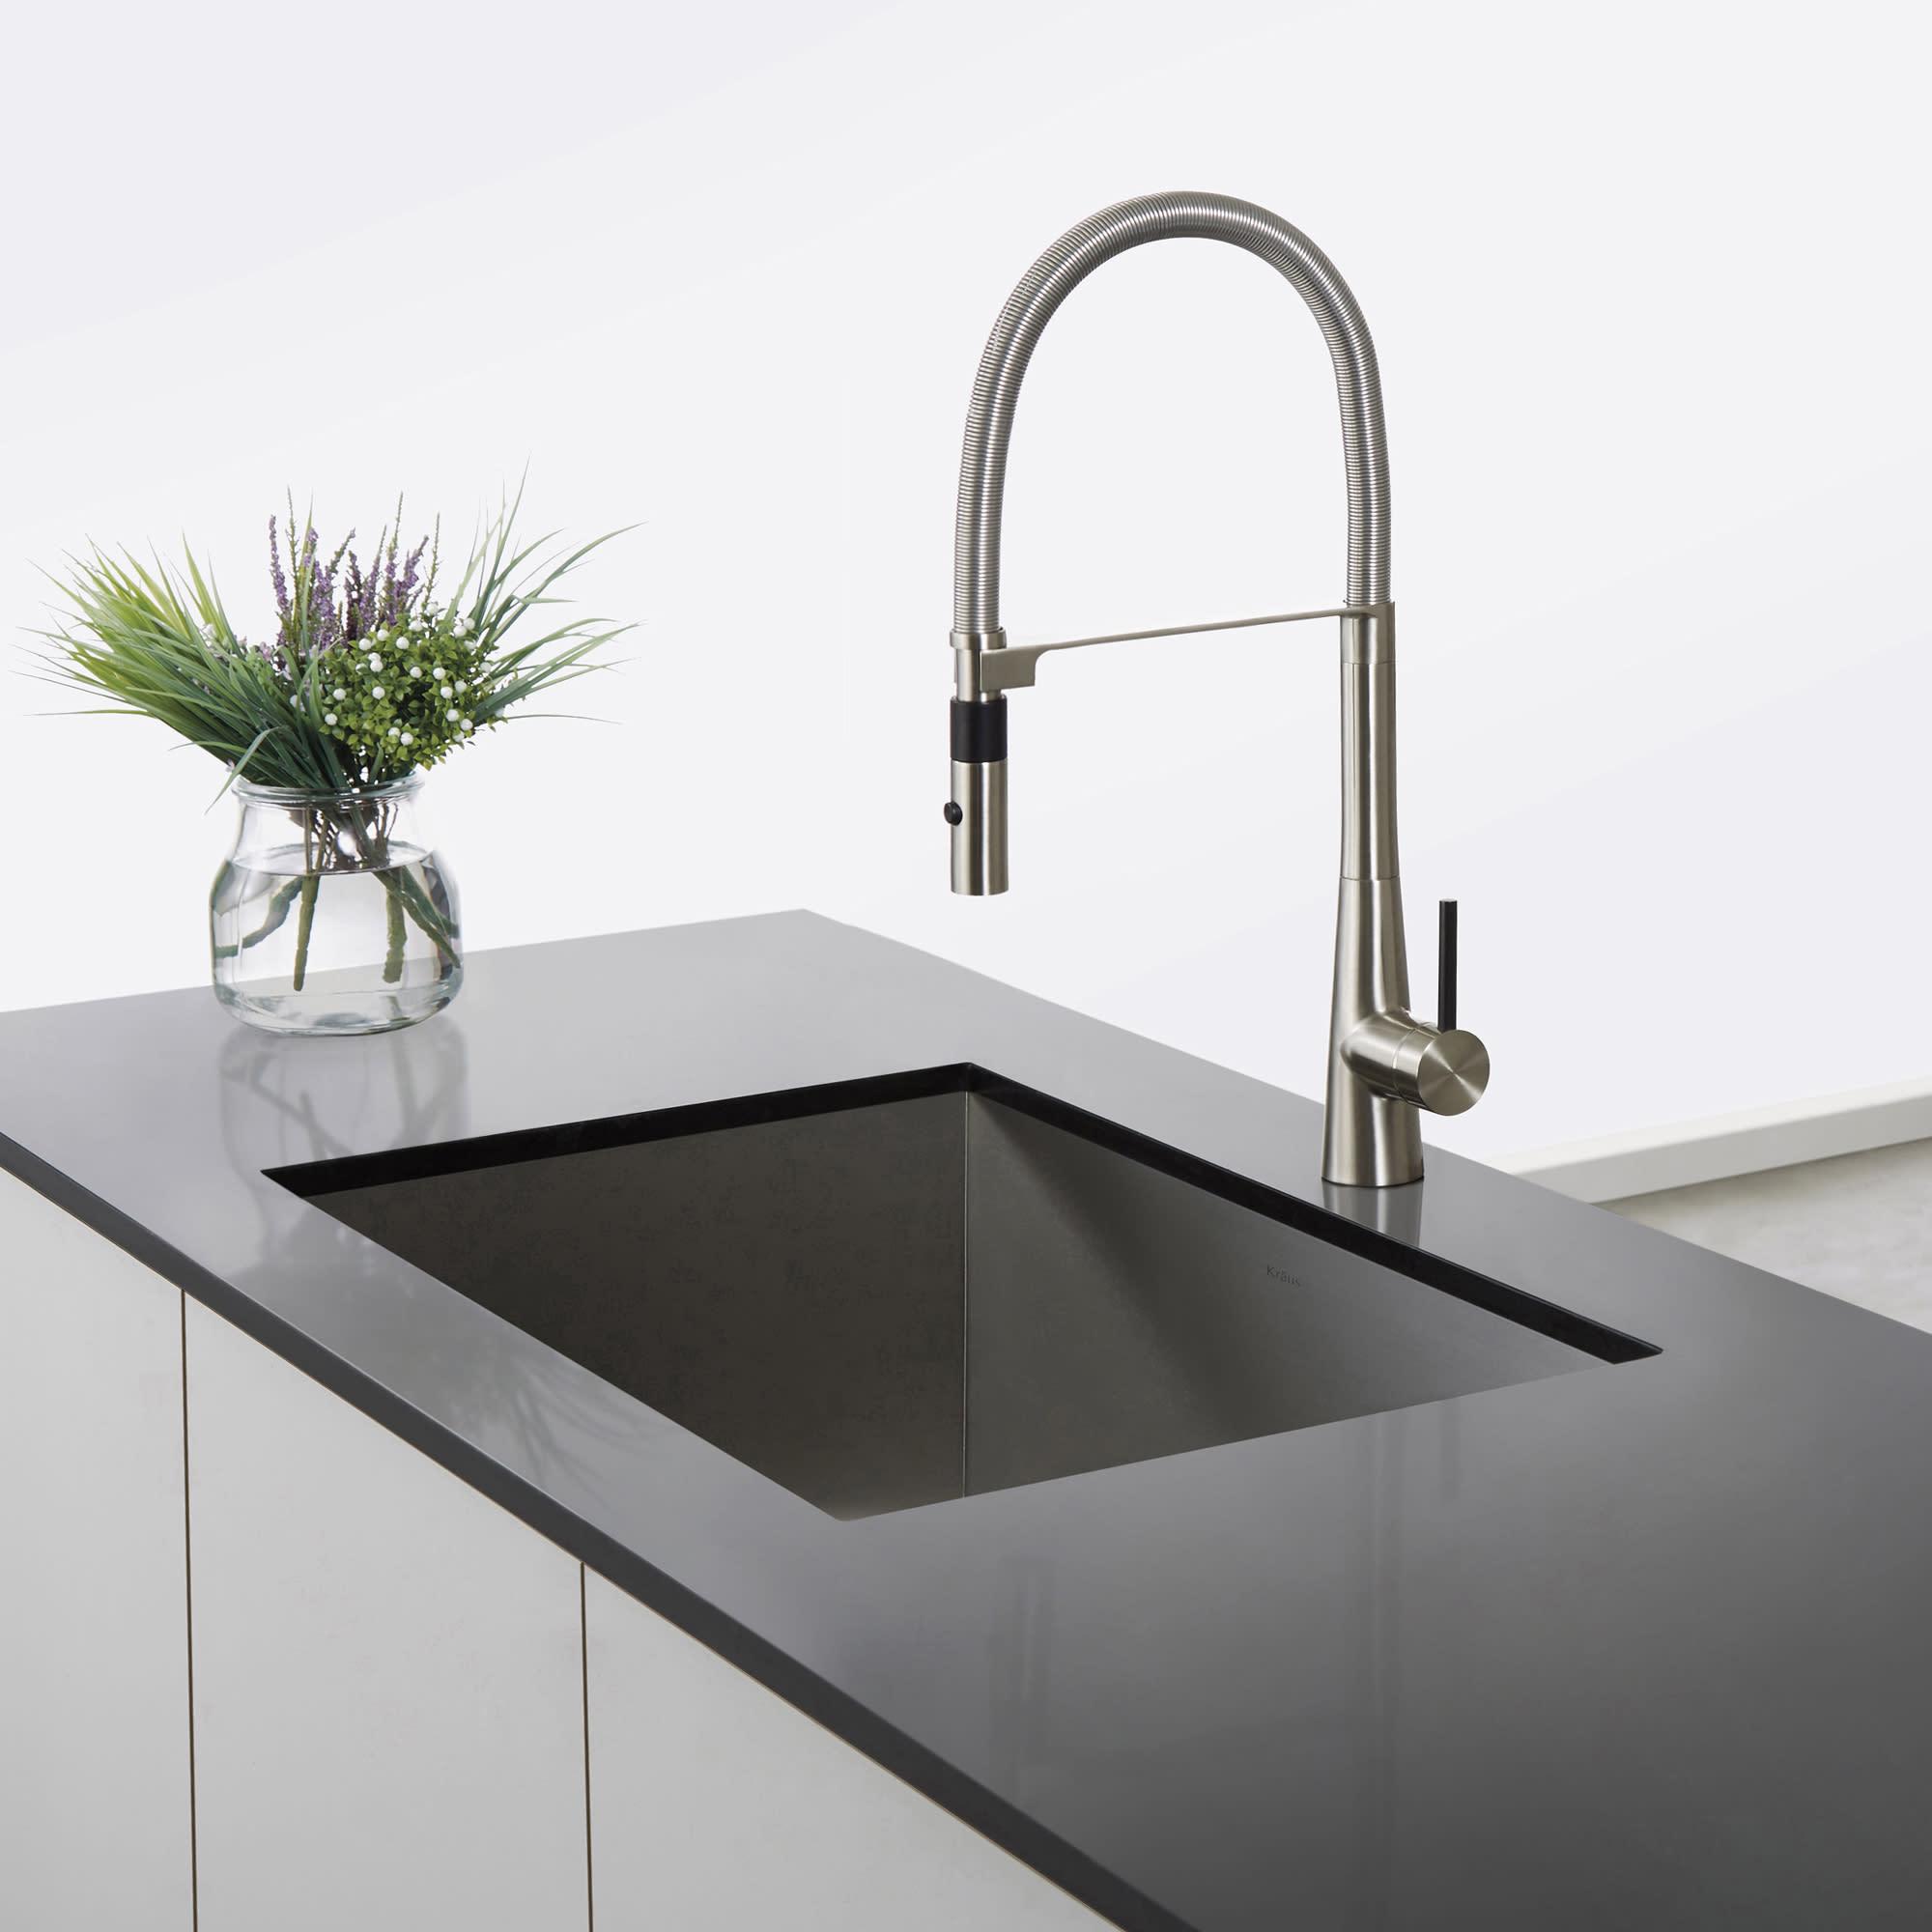 kraus spotlight commercial kitchen faucet Kraus Crespo Series Commercial Kitchen Faucet